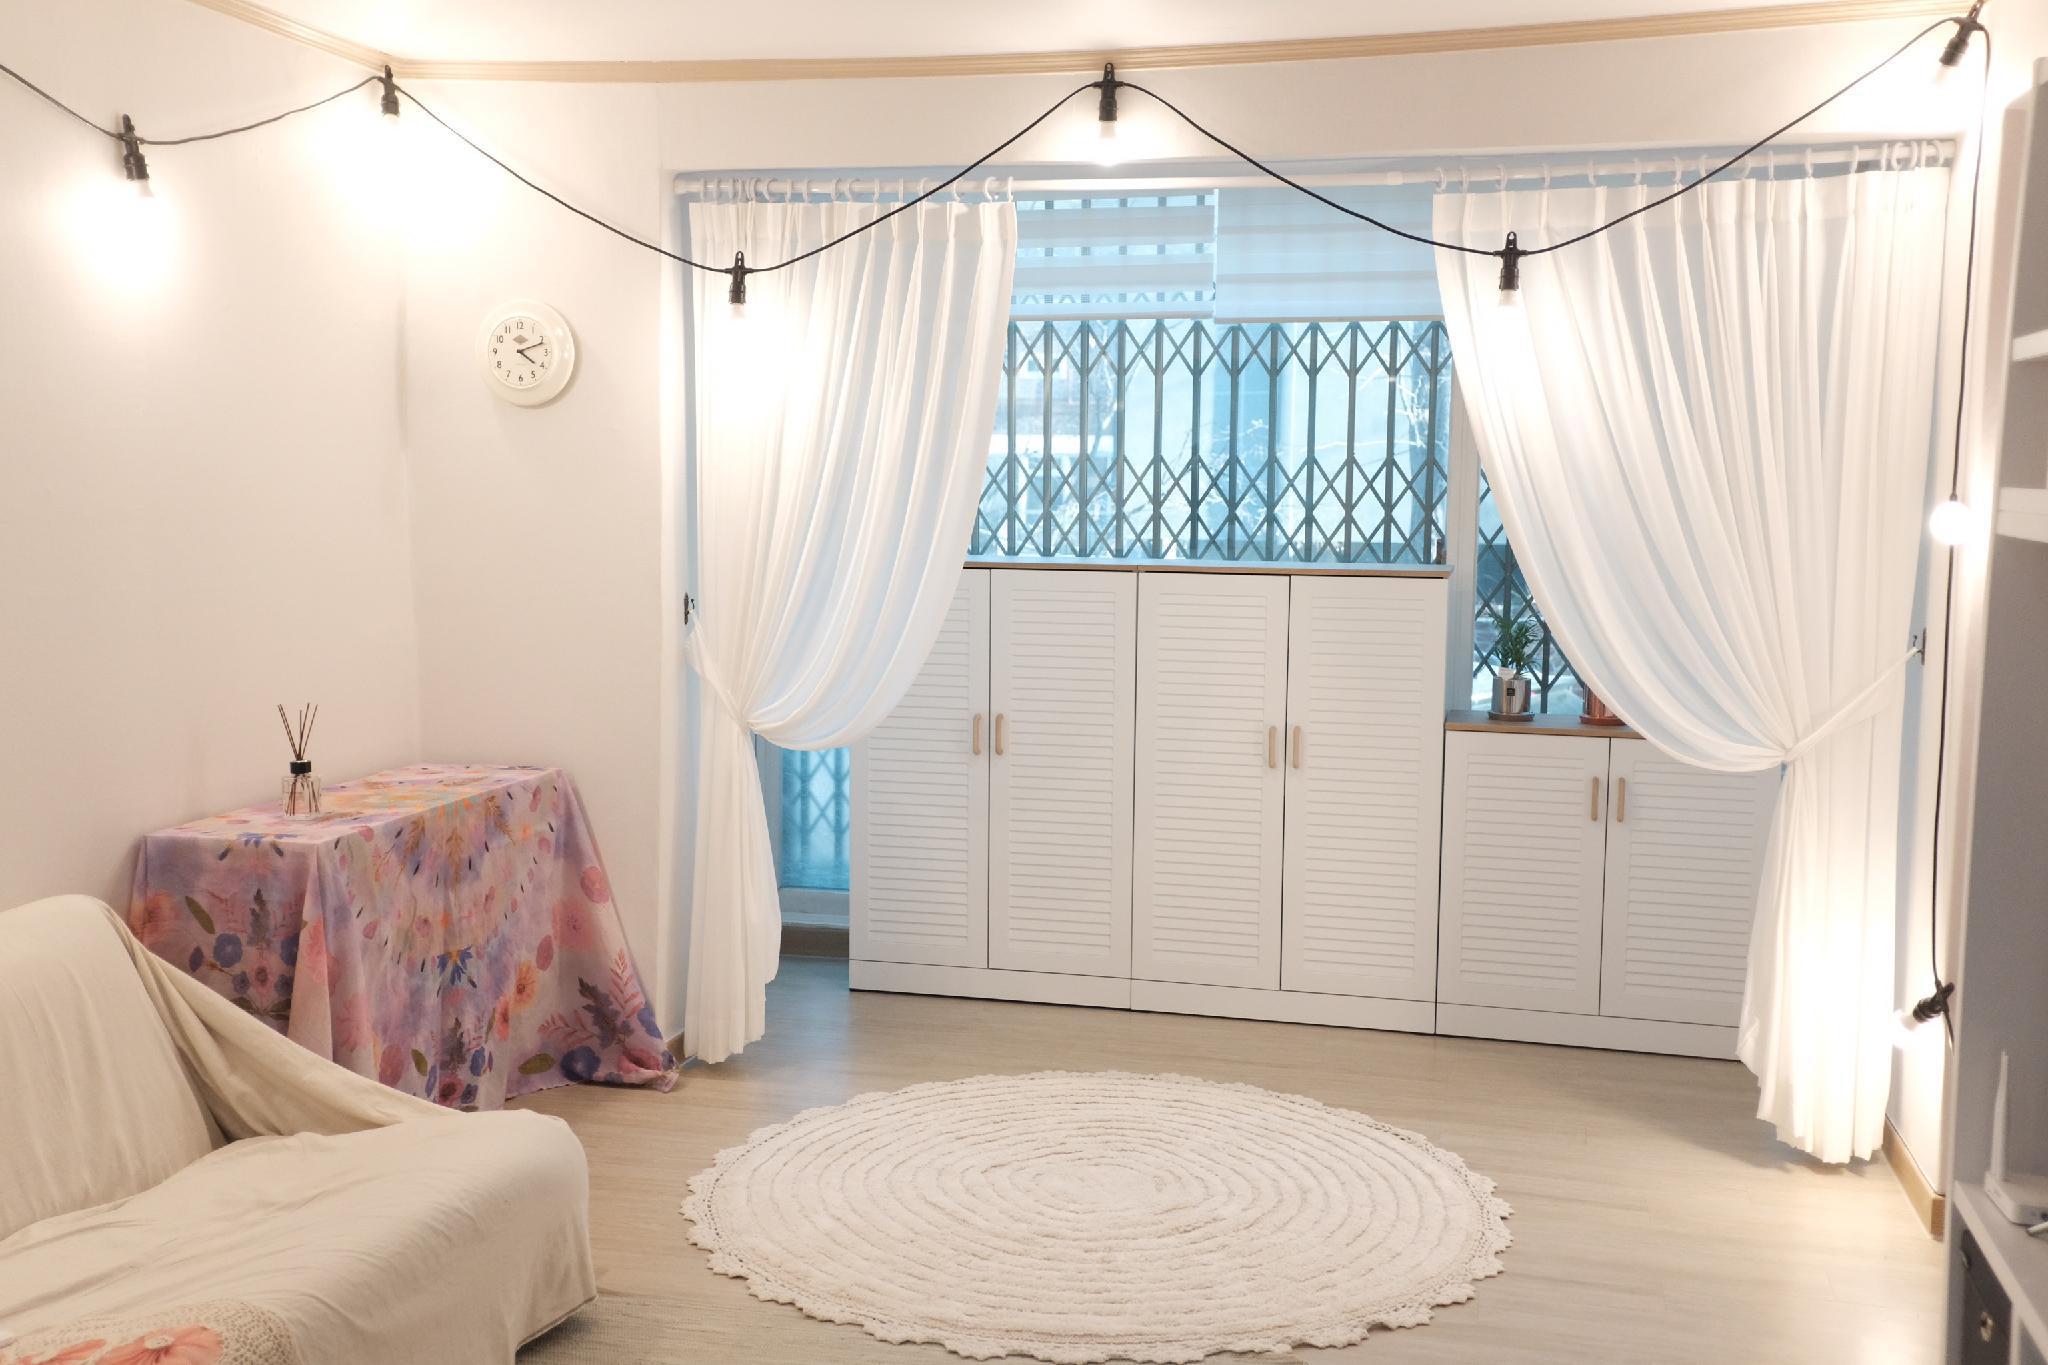 A Prettyandcomfortable House To Make Korean Friends